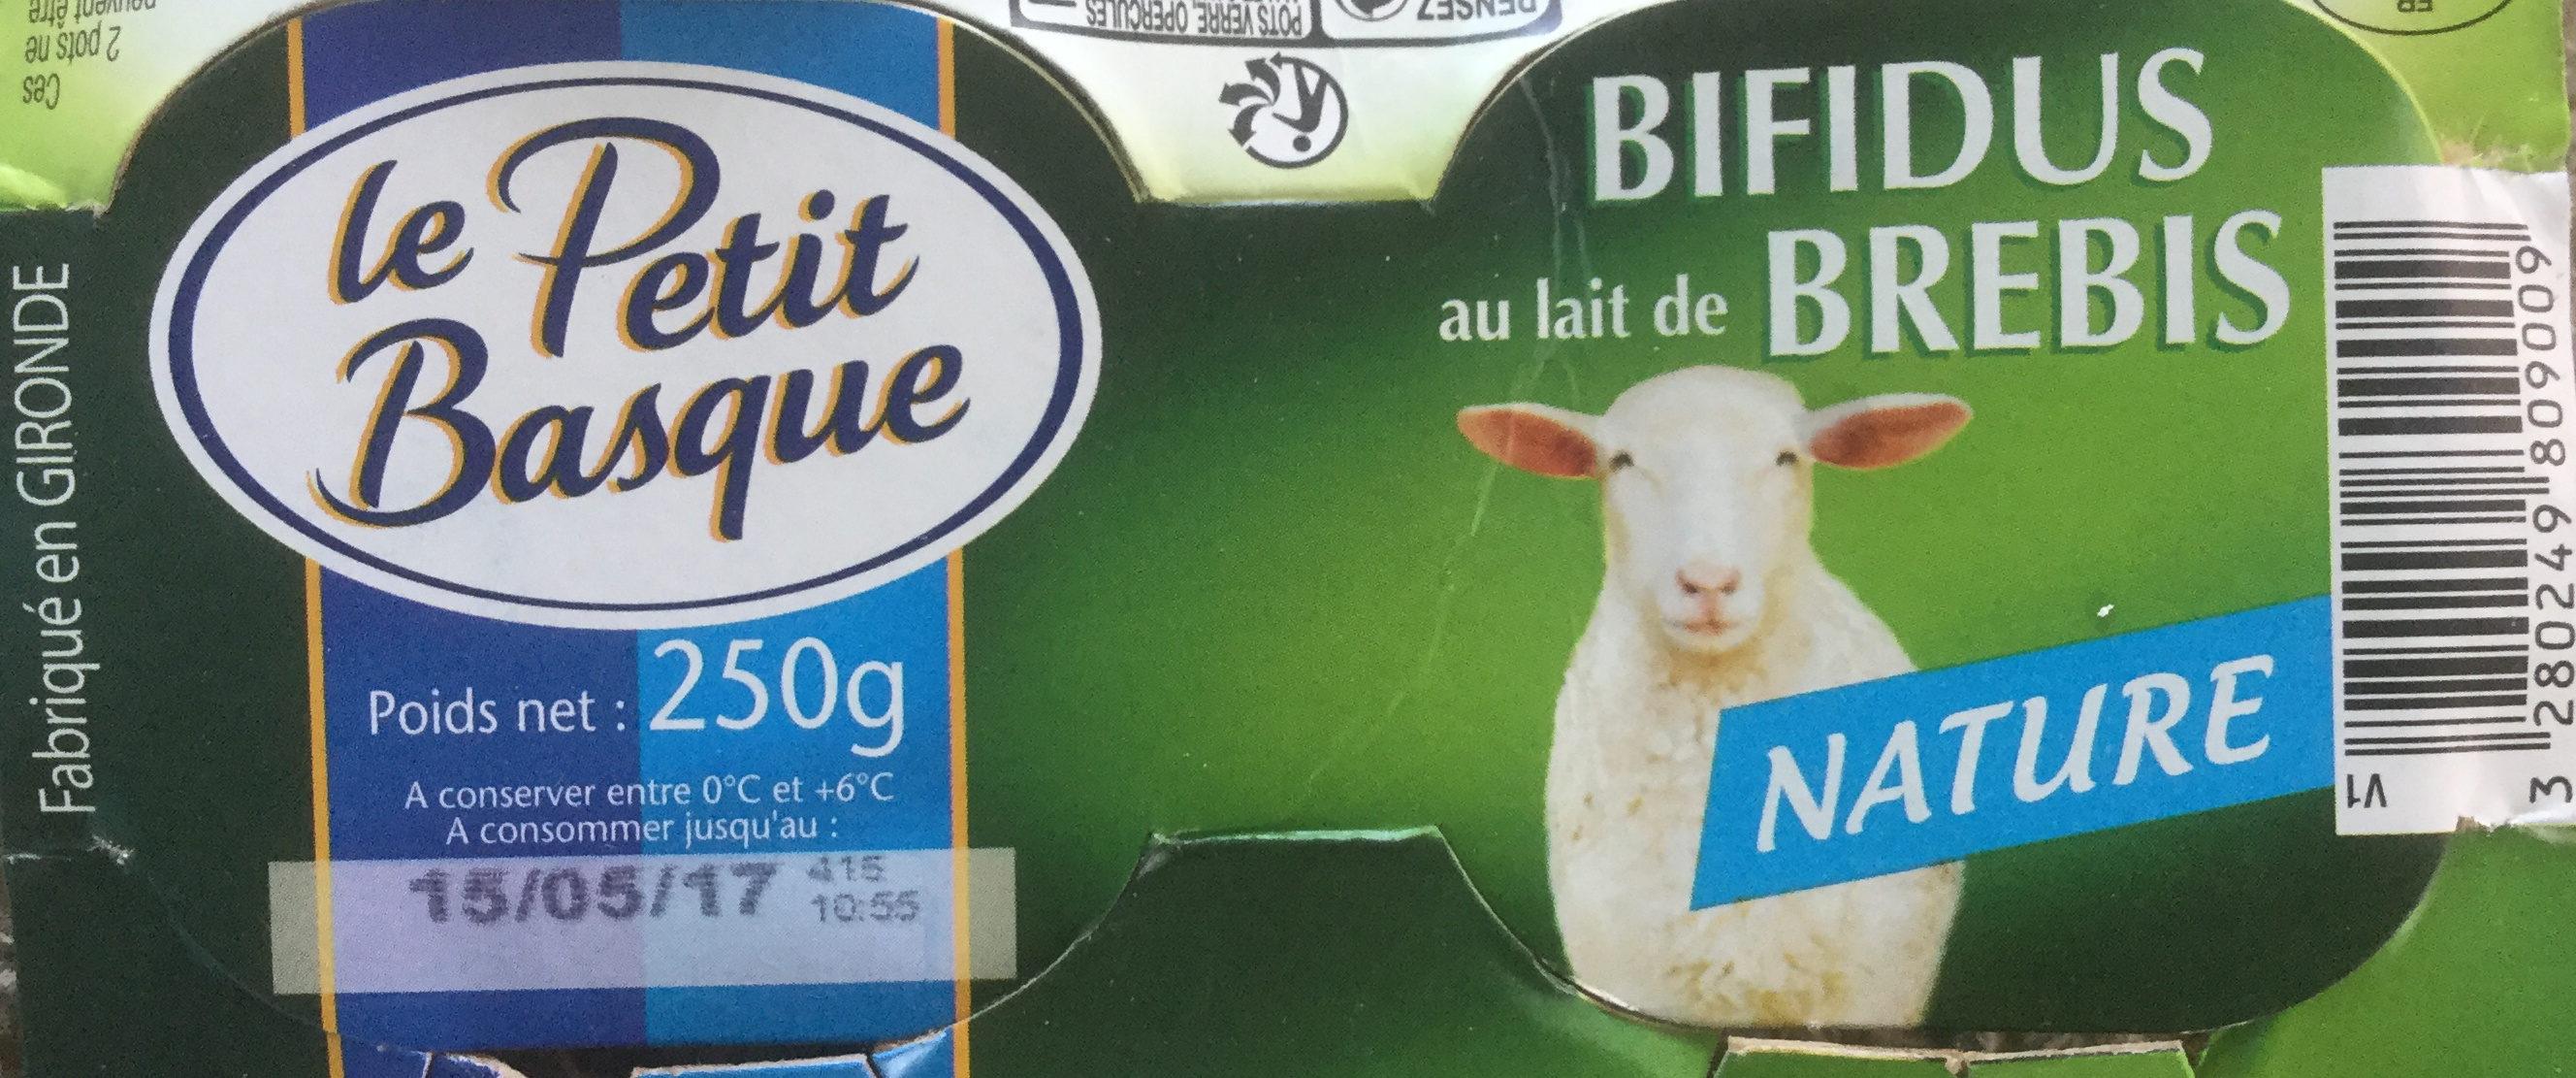 Yaourt brebis - Product - fr